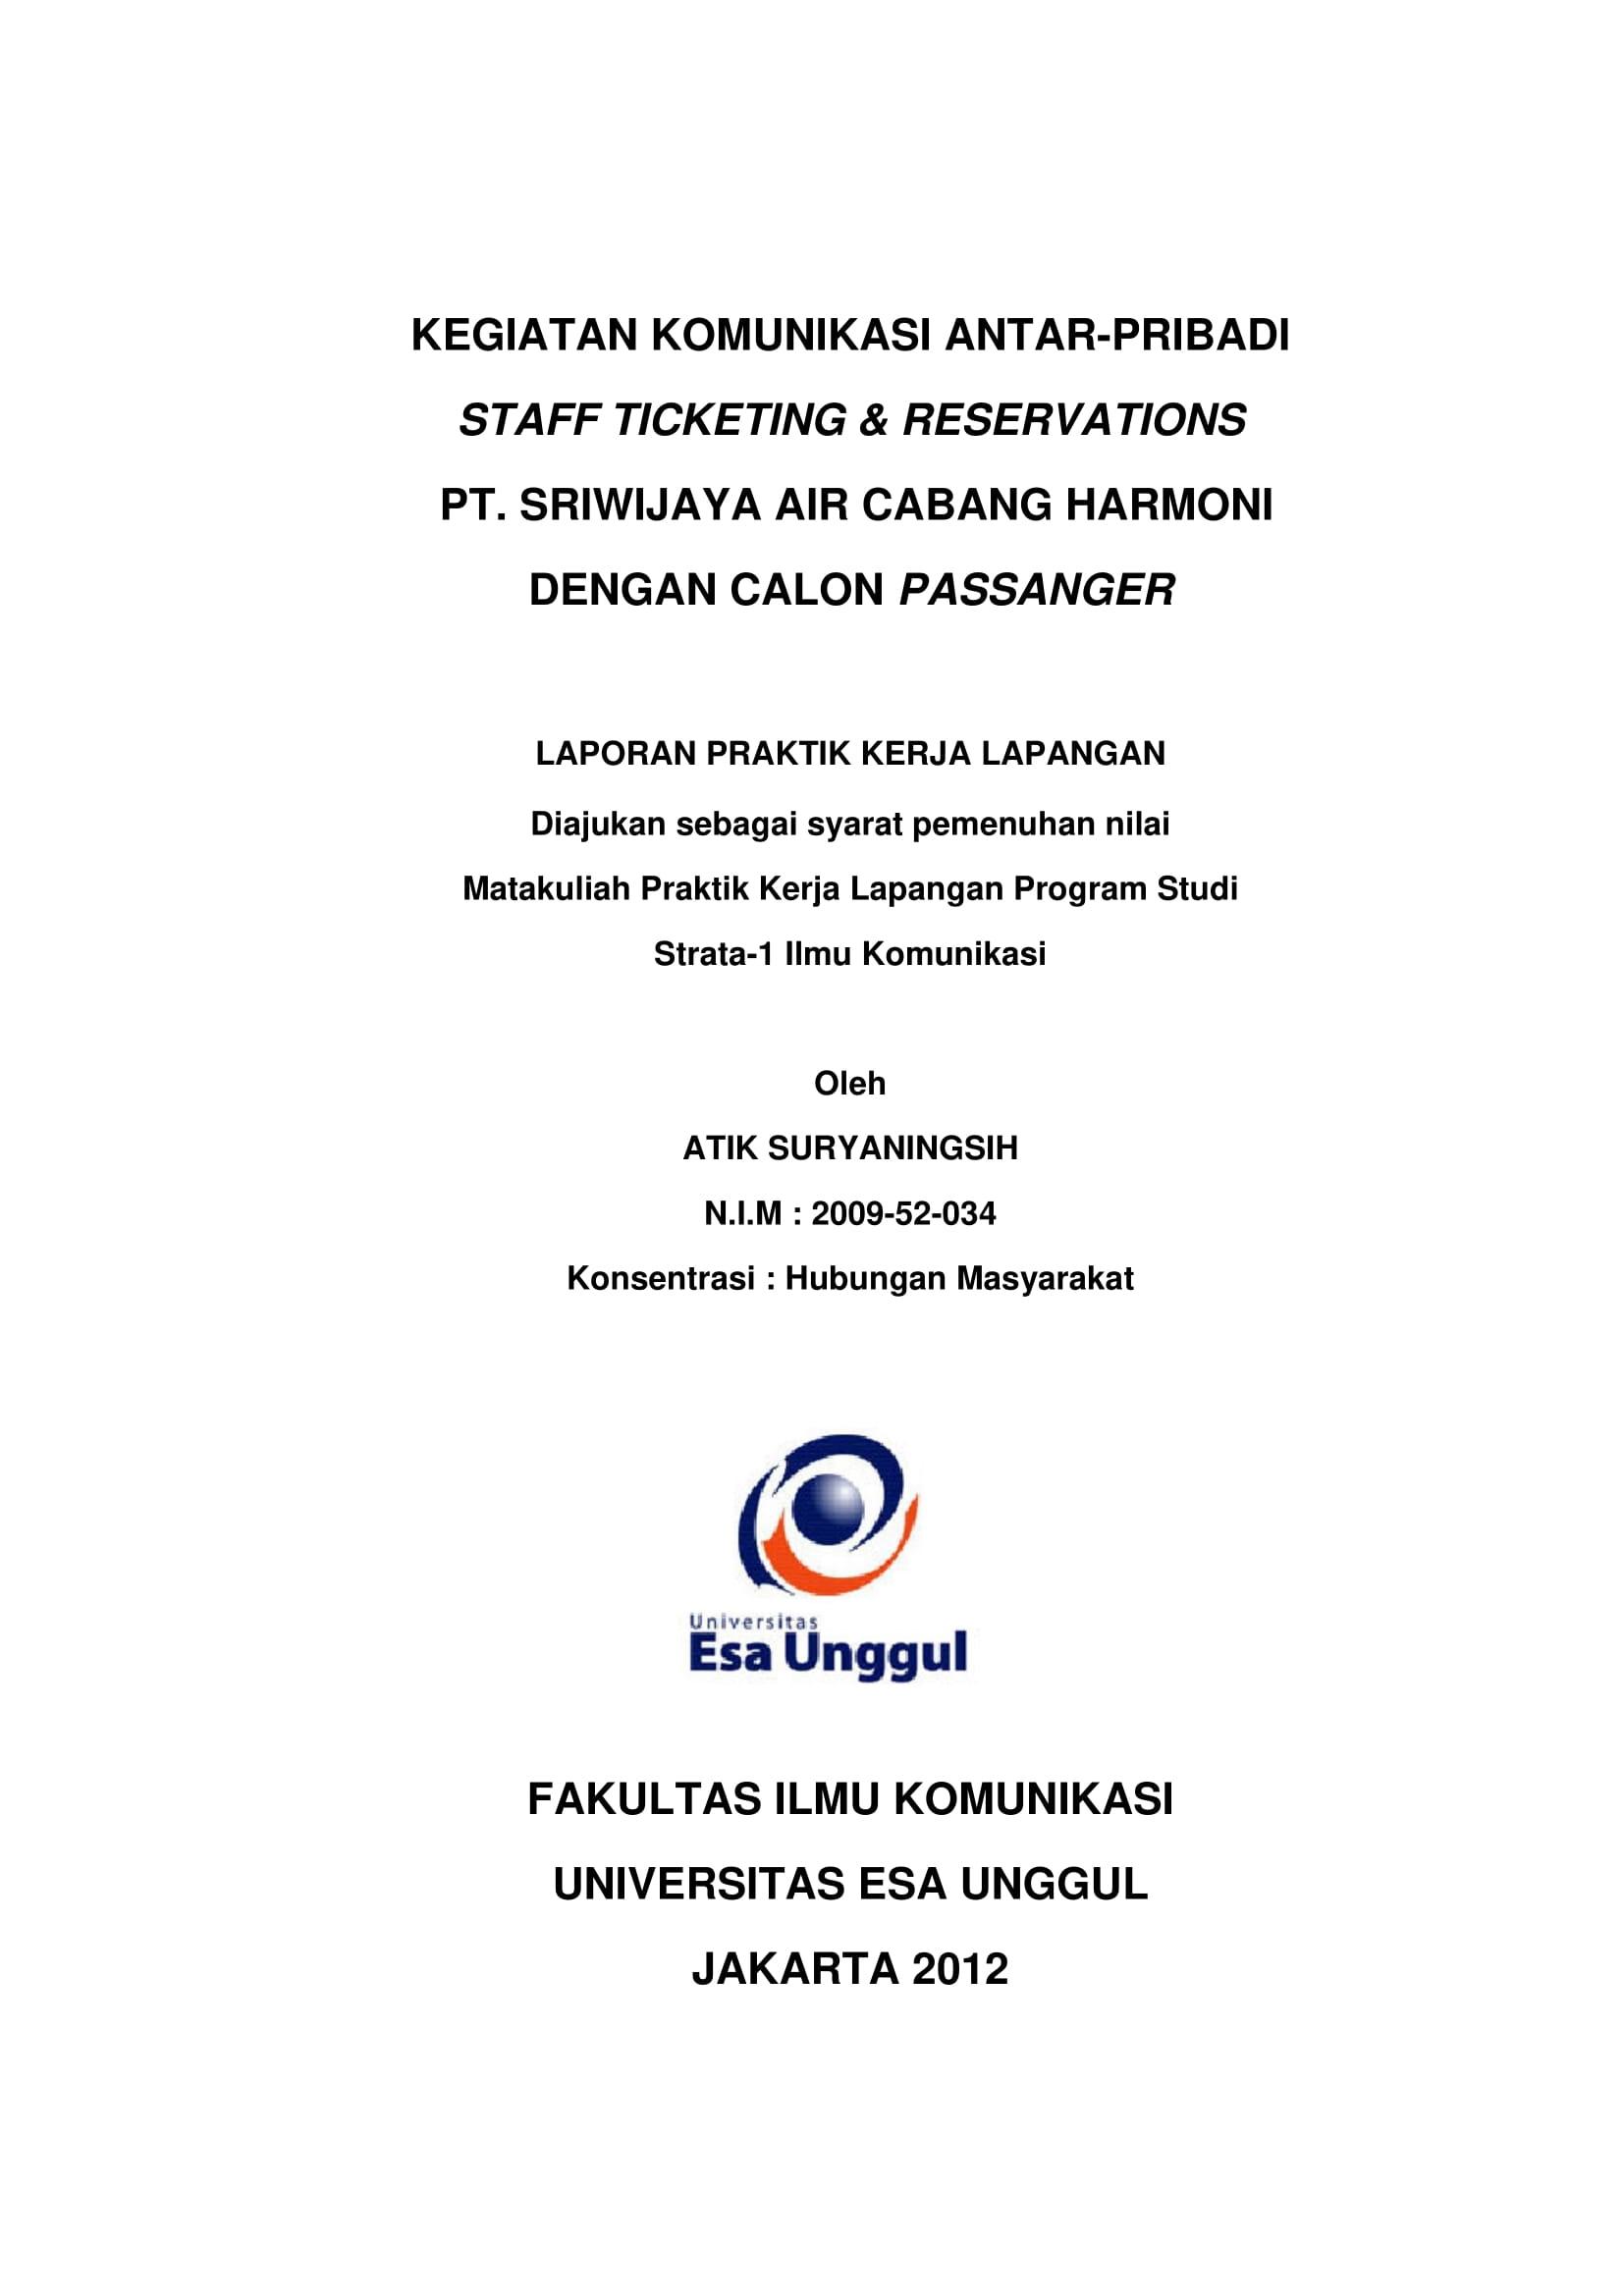 Kegiatan Komunikasi Antar-Pribadi Staff Ticketing & Reservations PT. SRIWIJAYA AIR Cabang Harmoni Dengan Calon Passanger